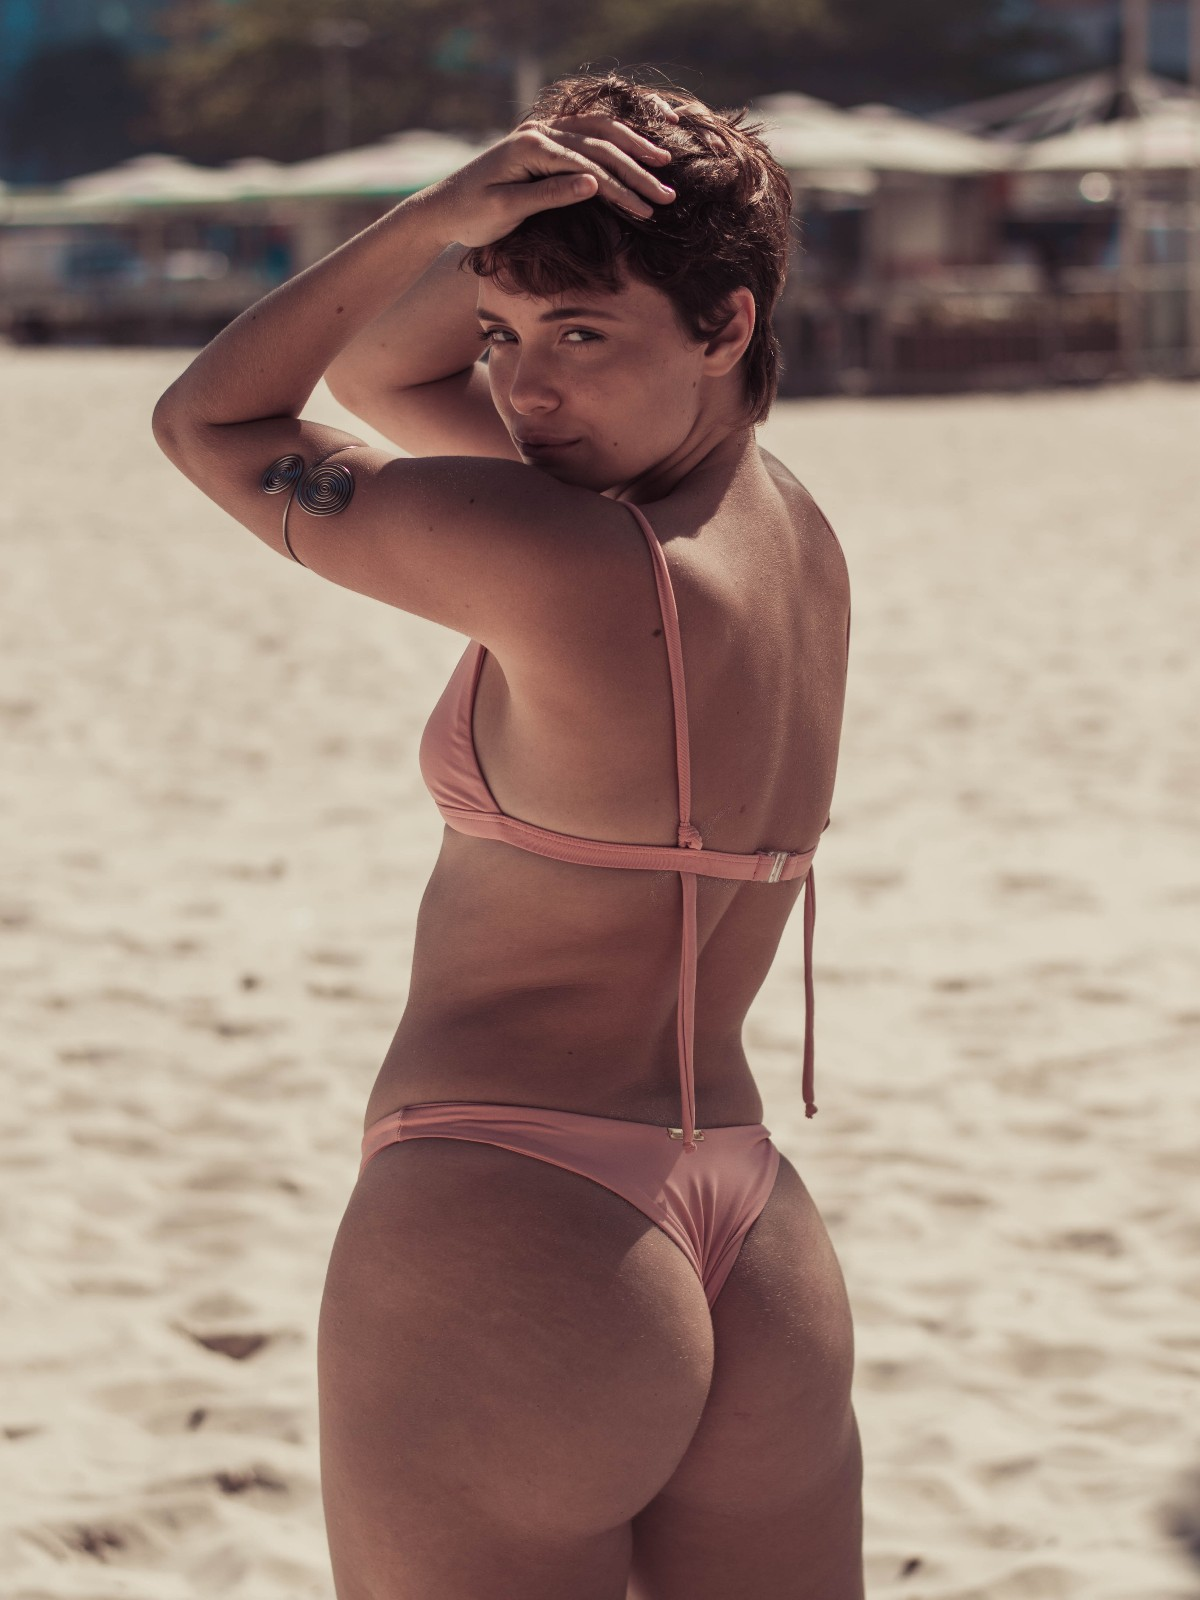 Biquíni Top Fixo + Asa Delta Nude Rosé Fio Duplo Confort Premium